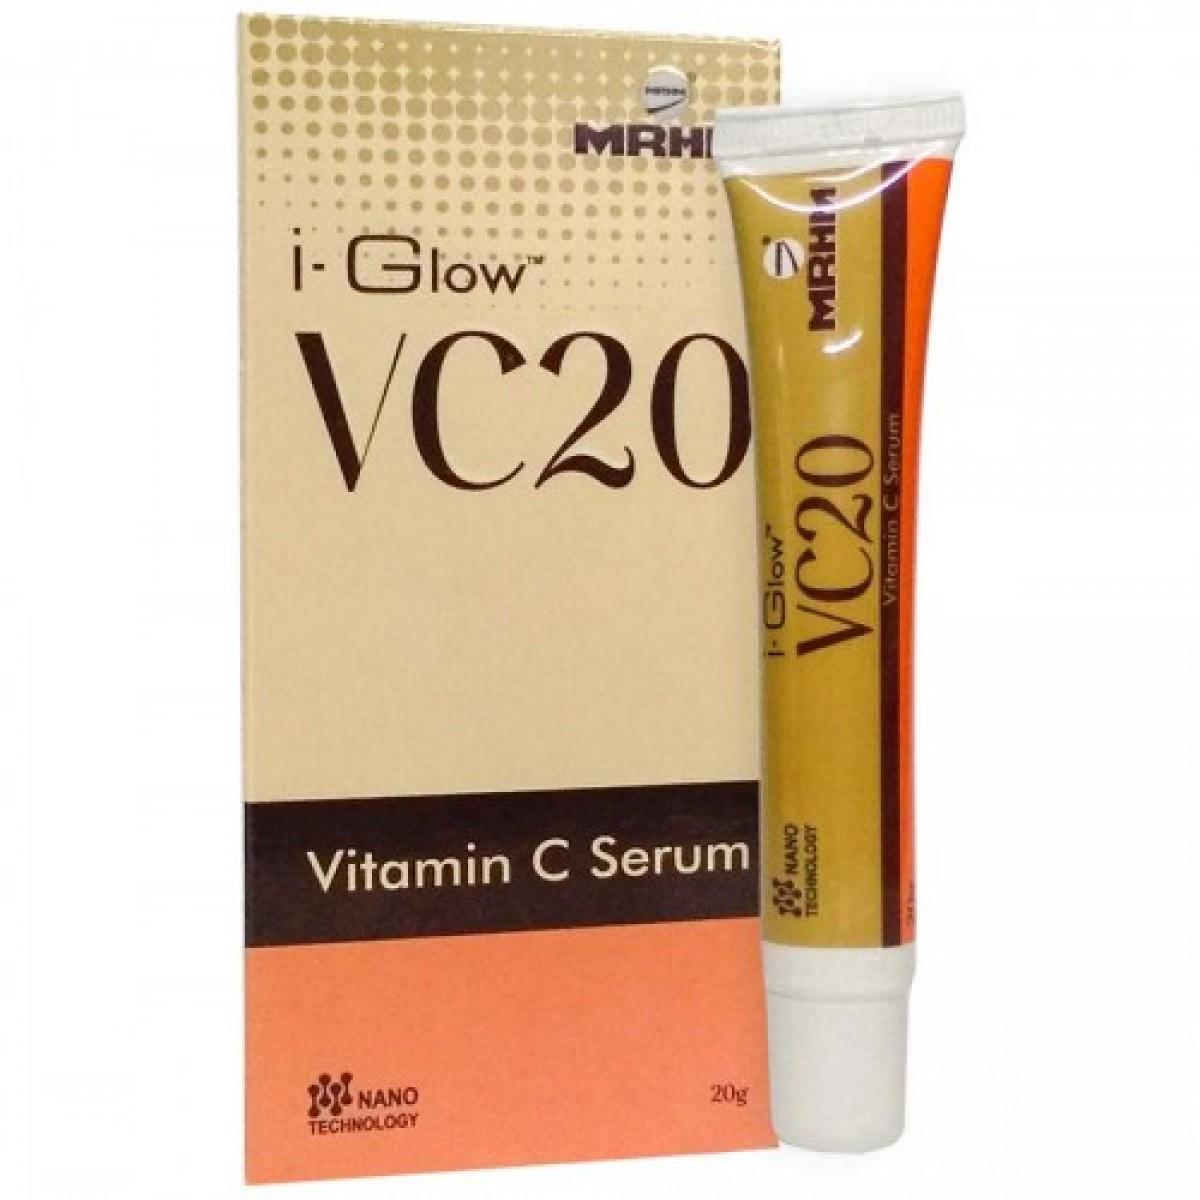 I Glow VC20  Vitamin C Serum 20g